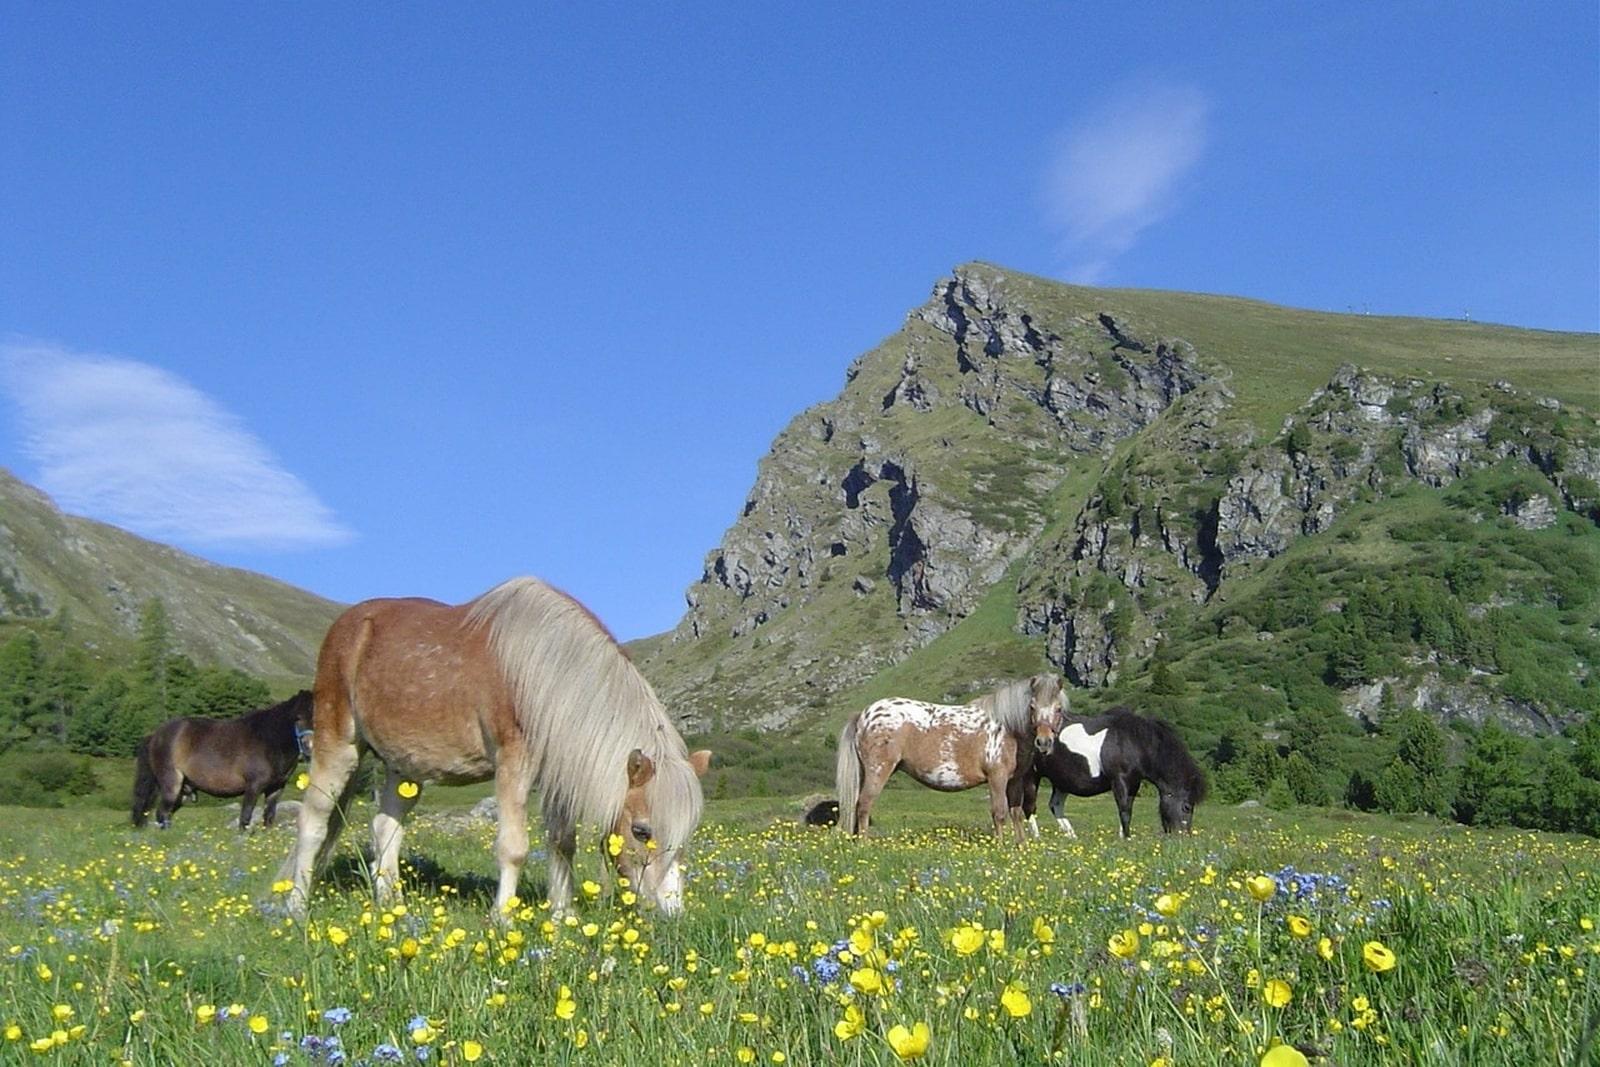 Heidi-Chalet-Falkert-Heidialm-Falkertsee-Natur-Wandern-Pferde